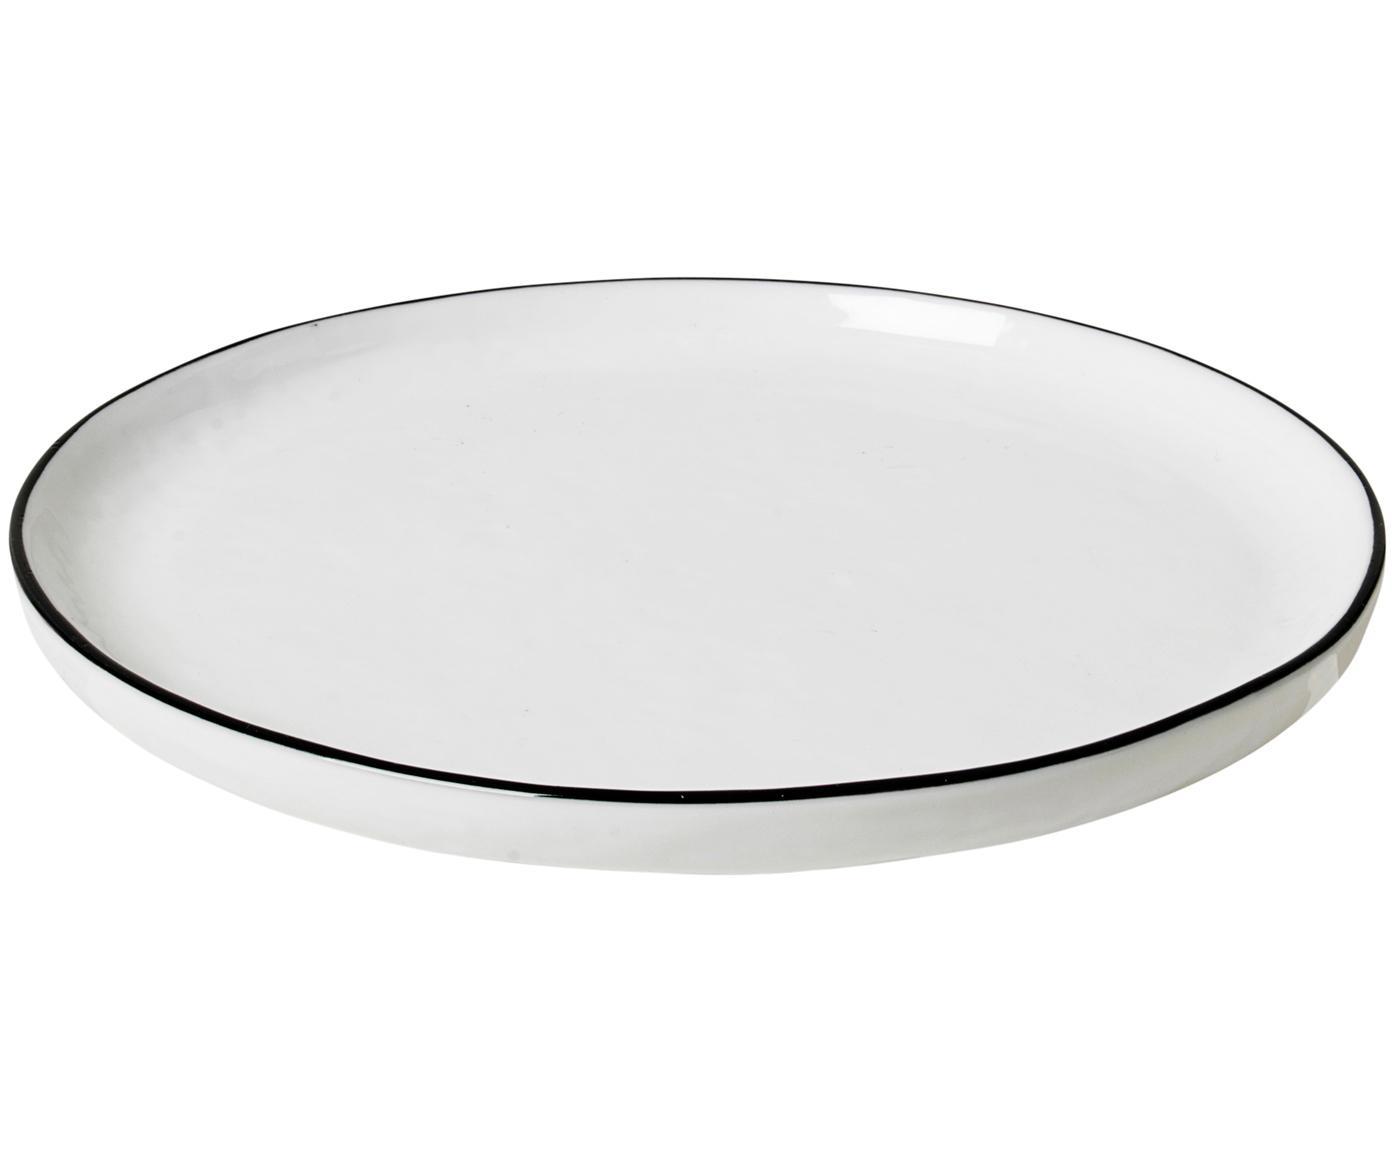 Piatto da dessert fatto a mano Salt 4 pz, Porcellana, Bianco latteo, nero, Ø 18 cm